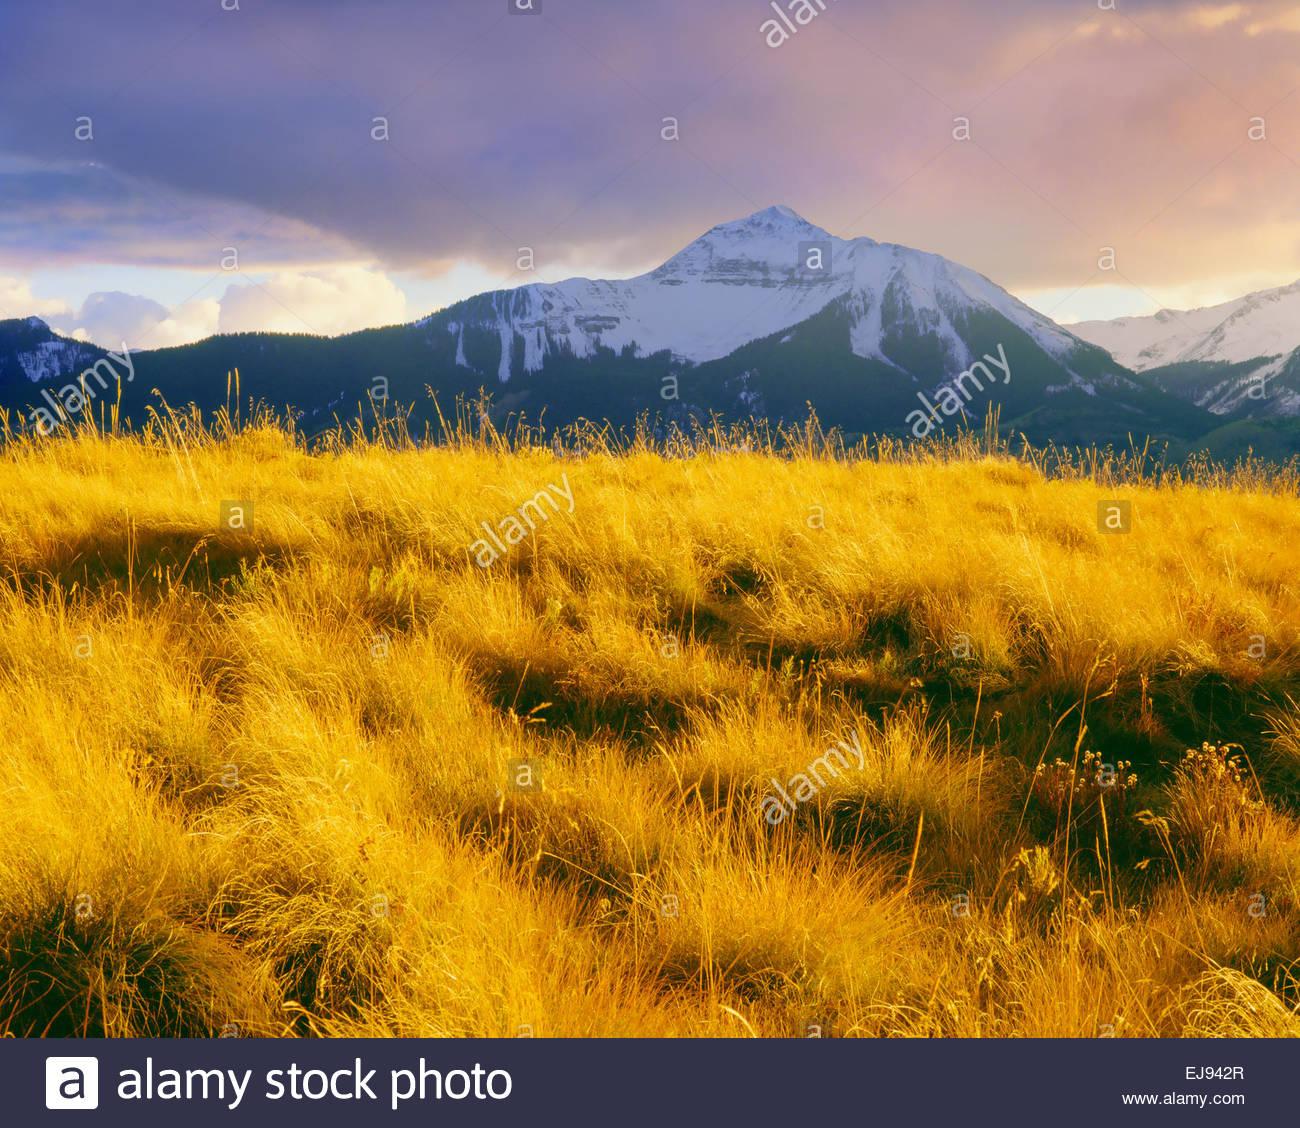 """Sunshine"" Montaña otoño de 'San Juan montañas' 'Uncompahgre National Forest' Imagen De Stock"